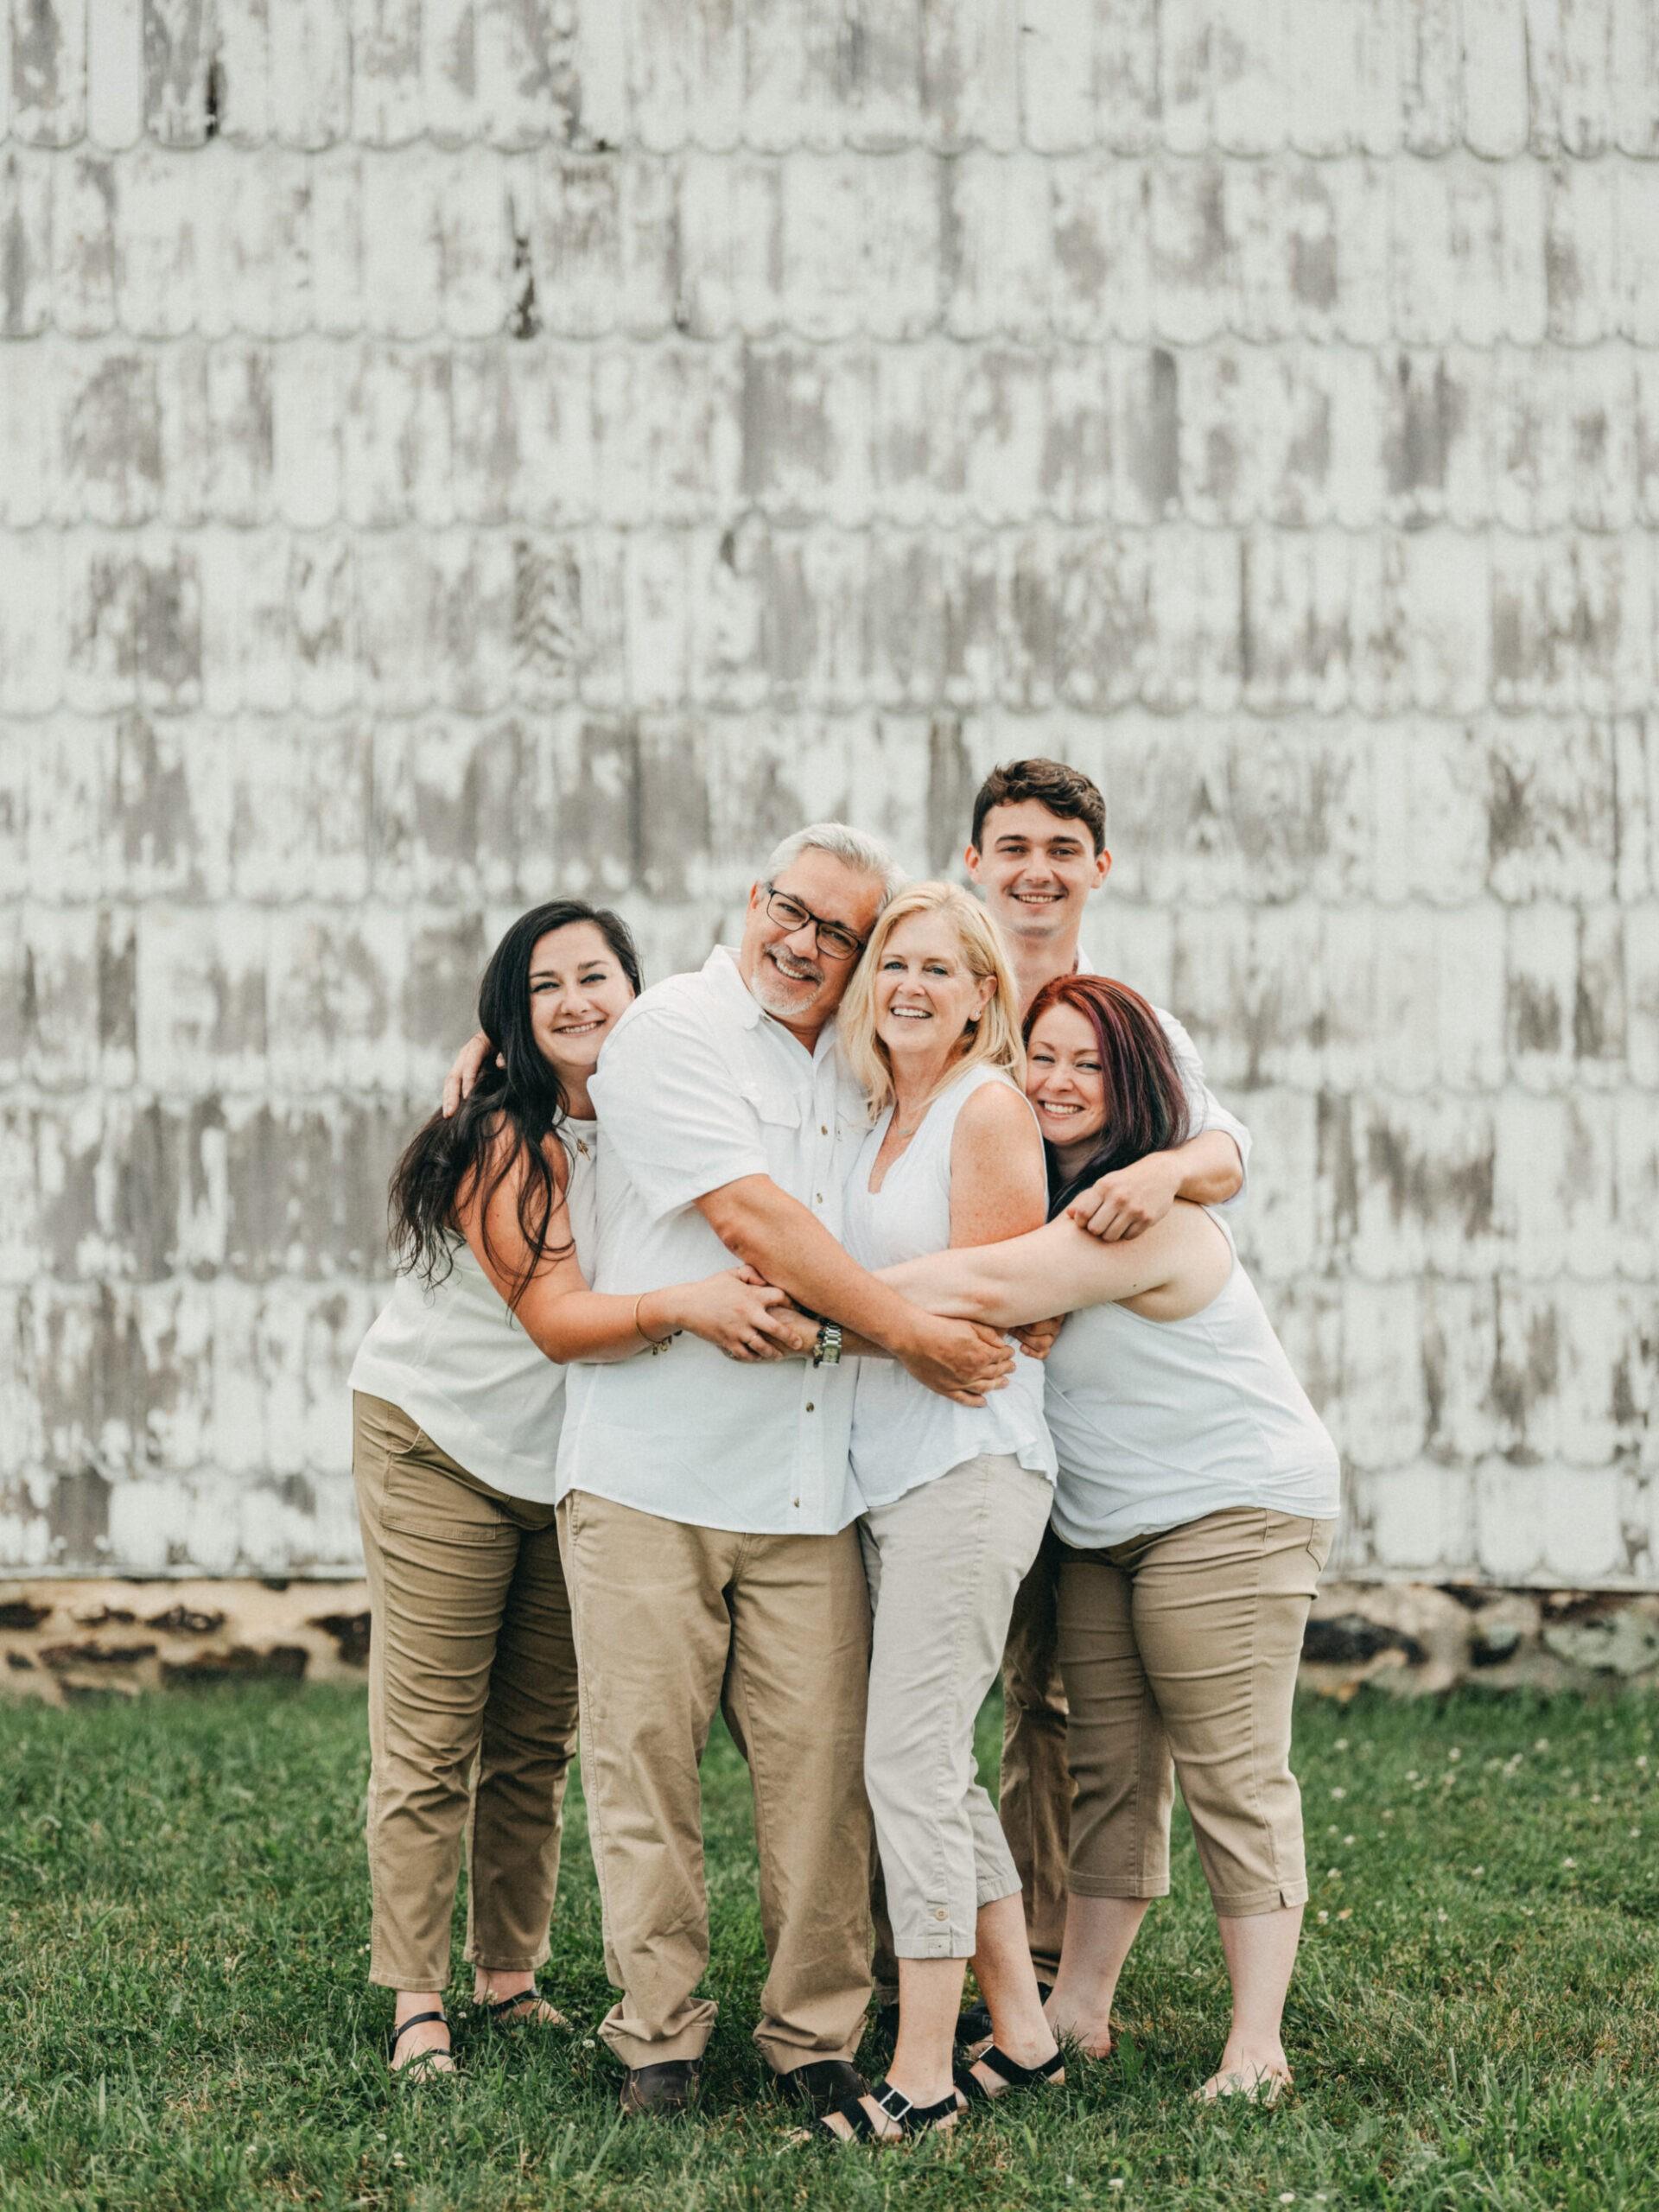 Philadelphia family lifestyle photographer for your important milestones